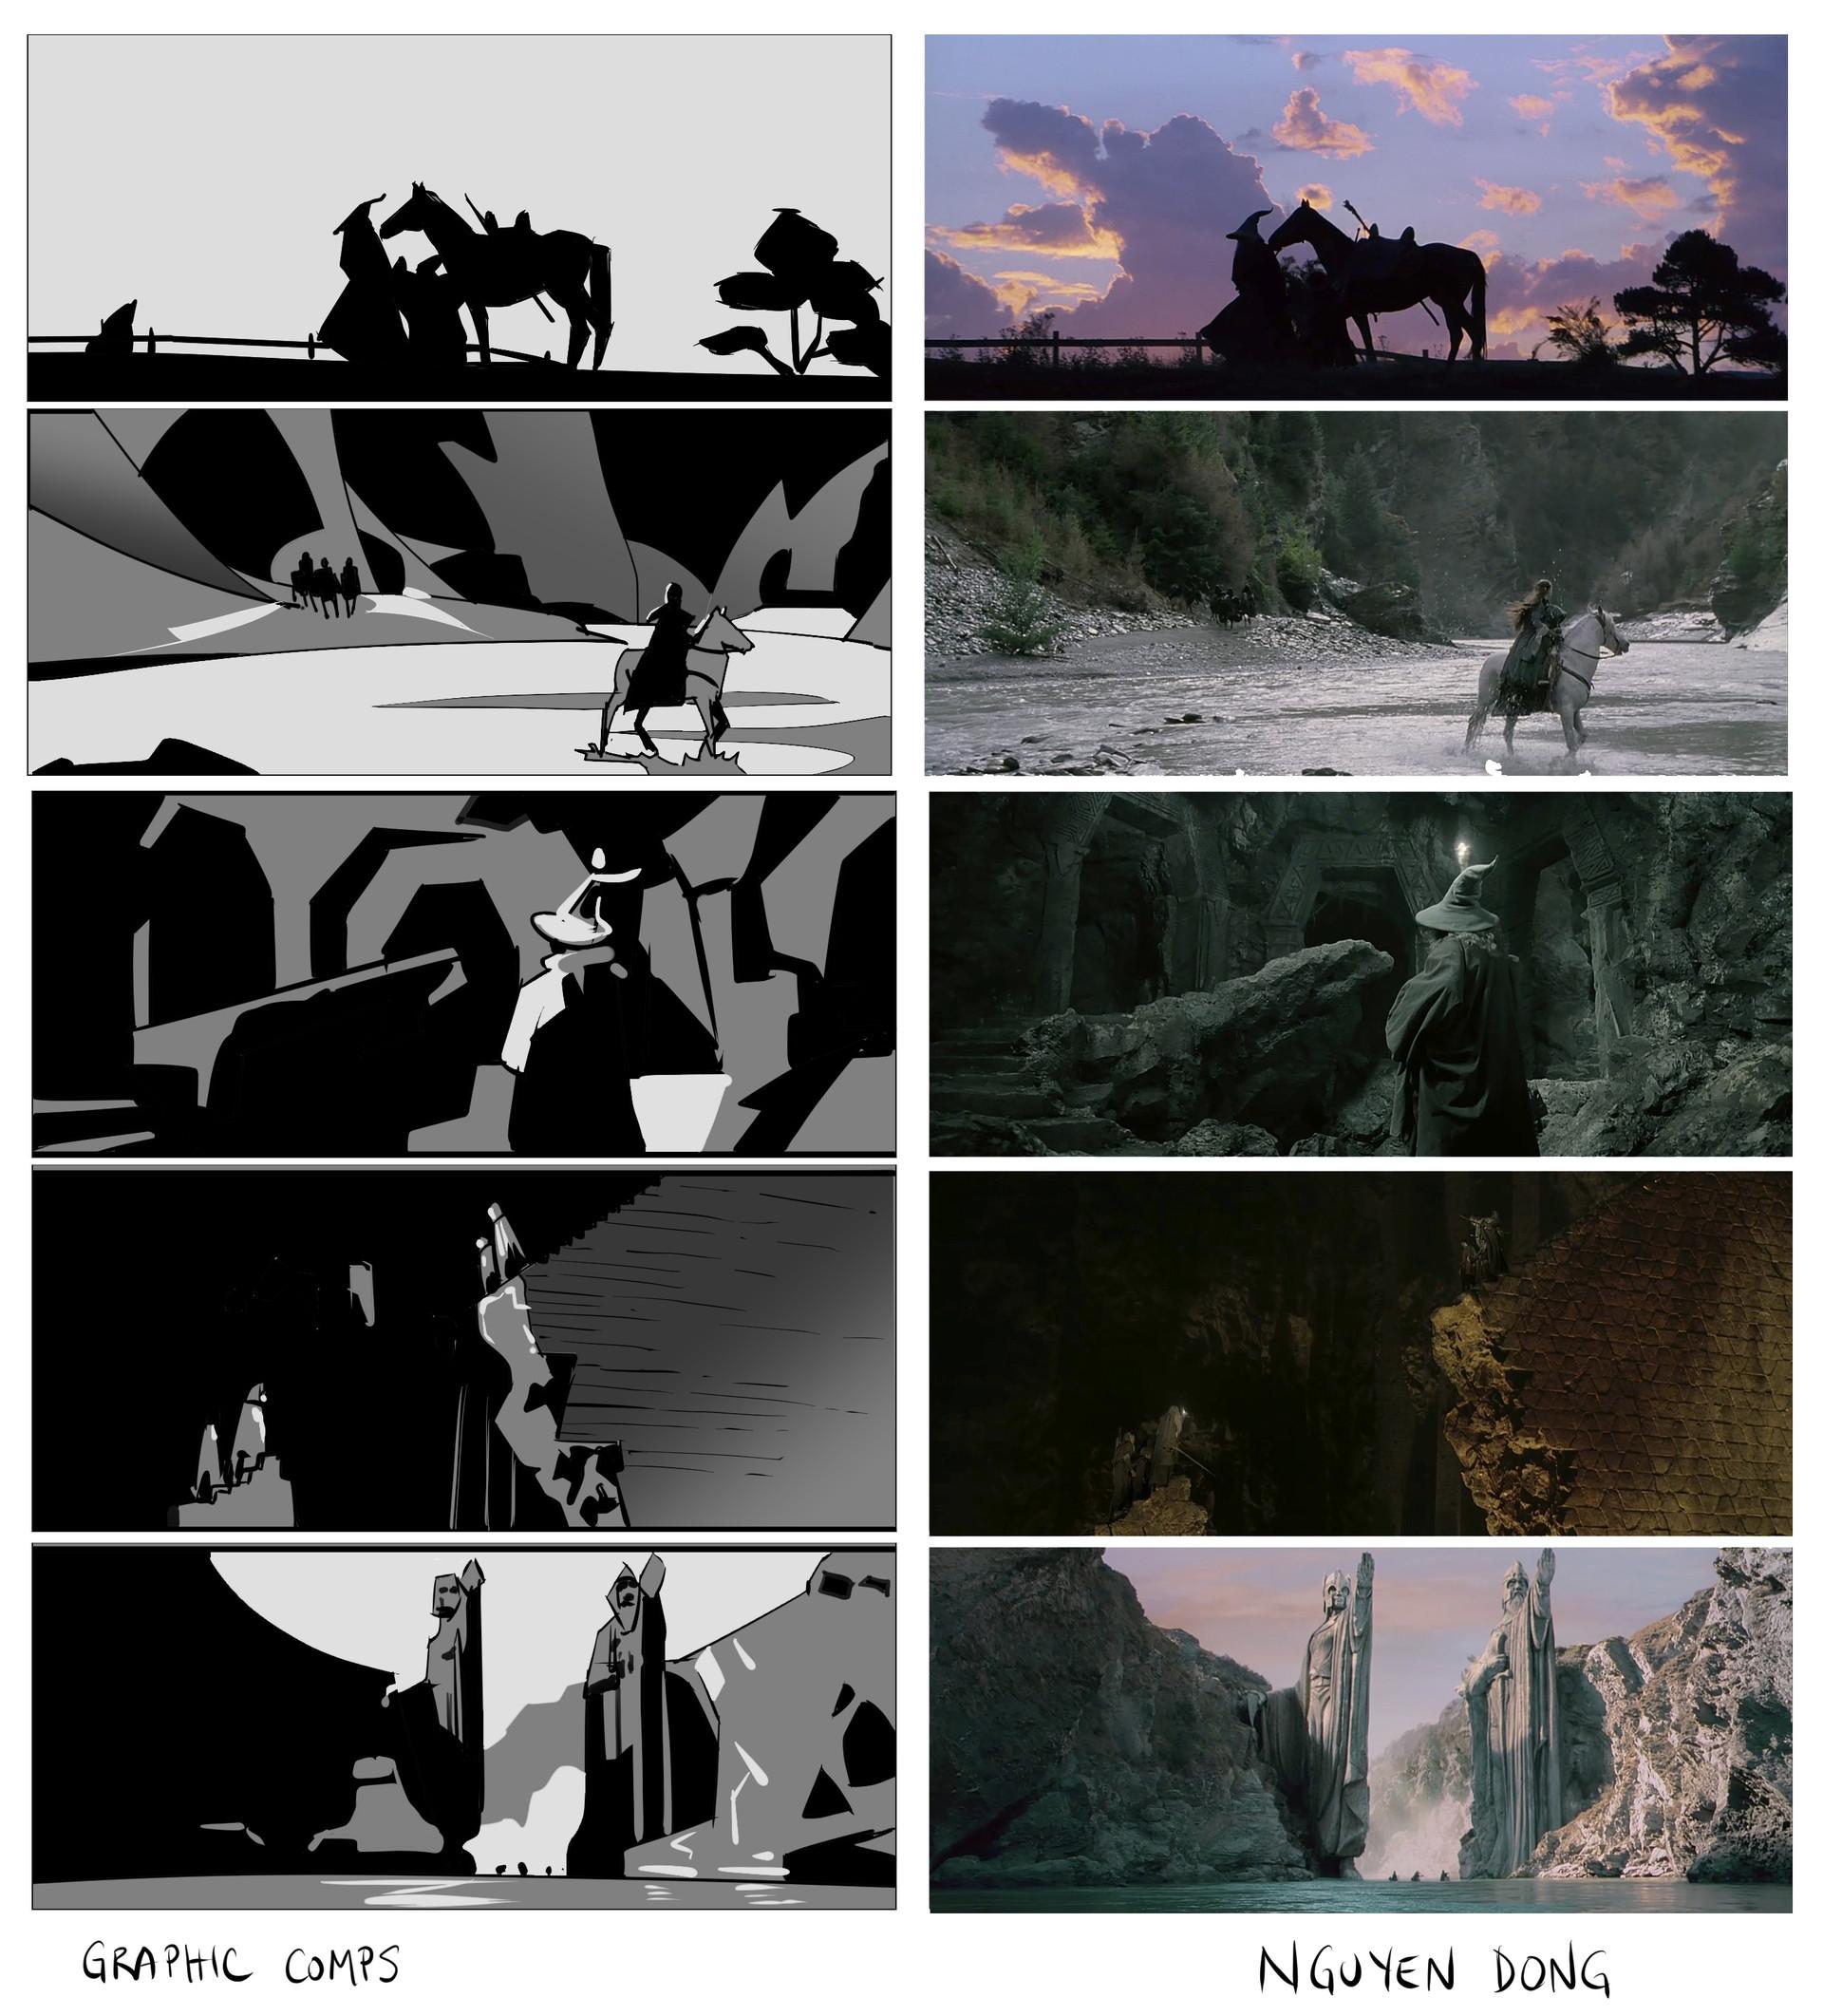 Frame studies - graphic composition